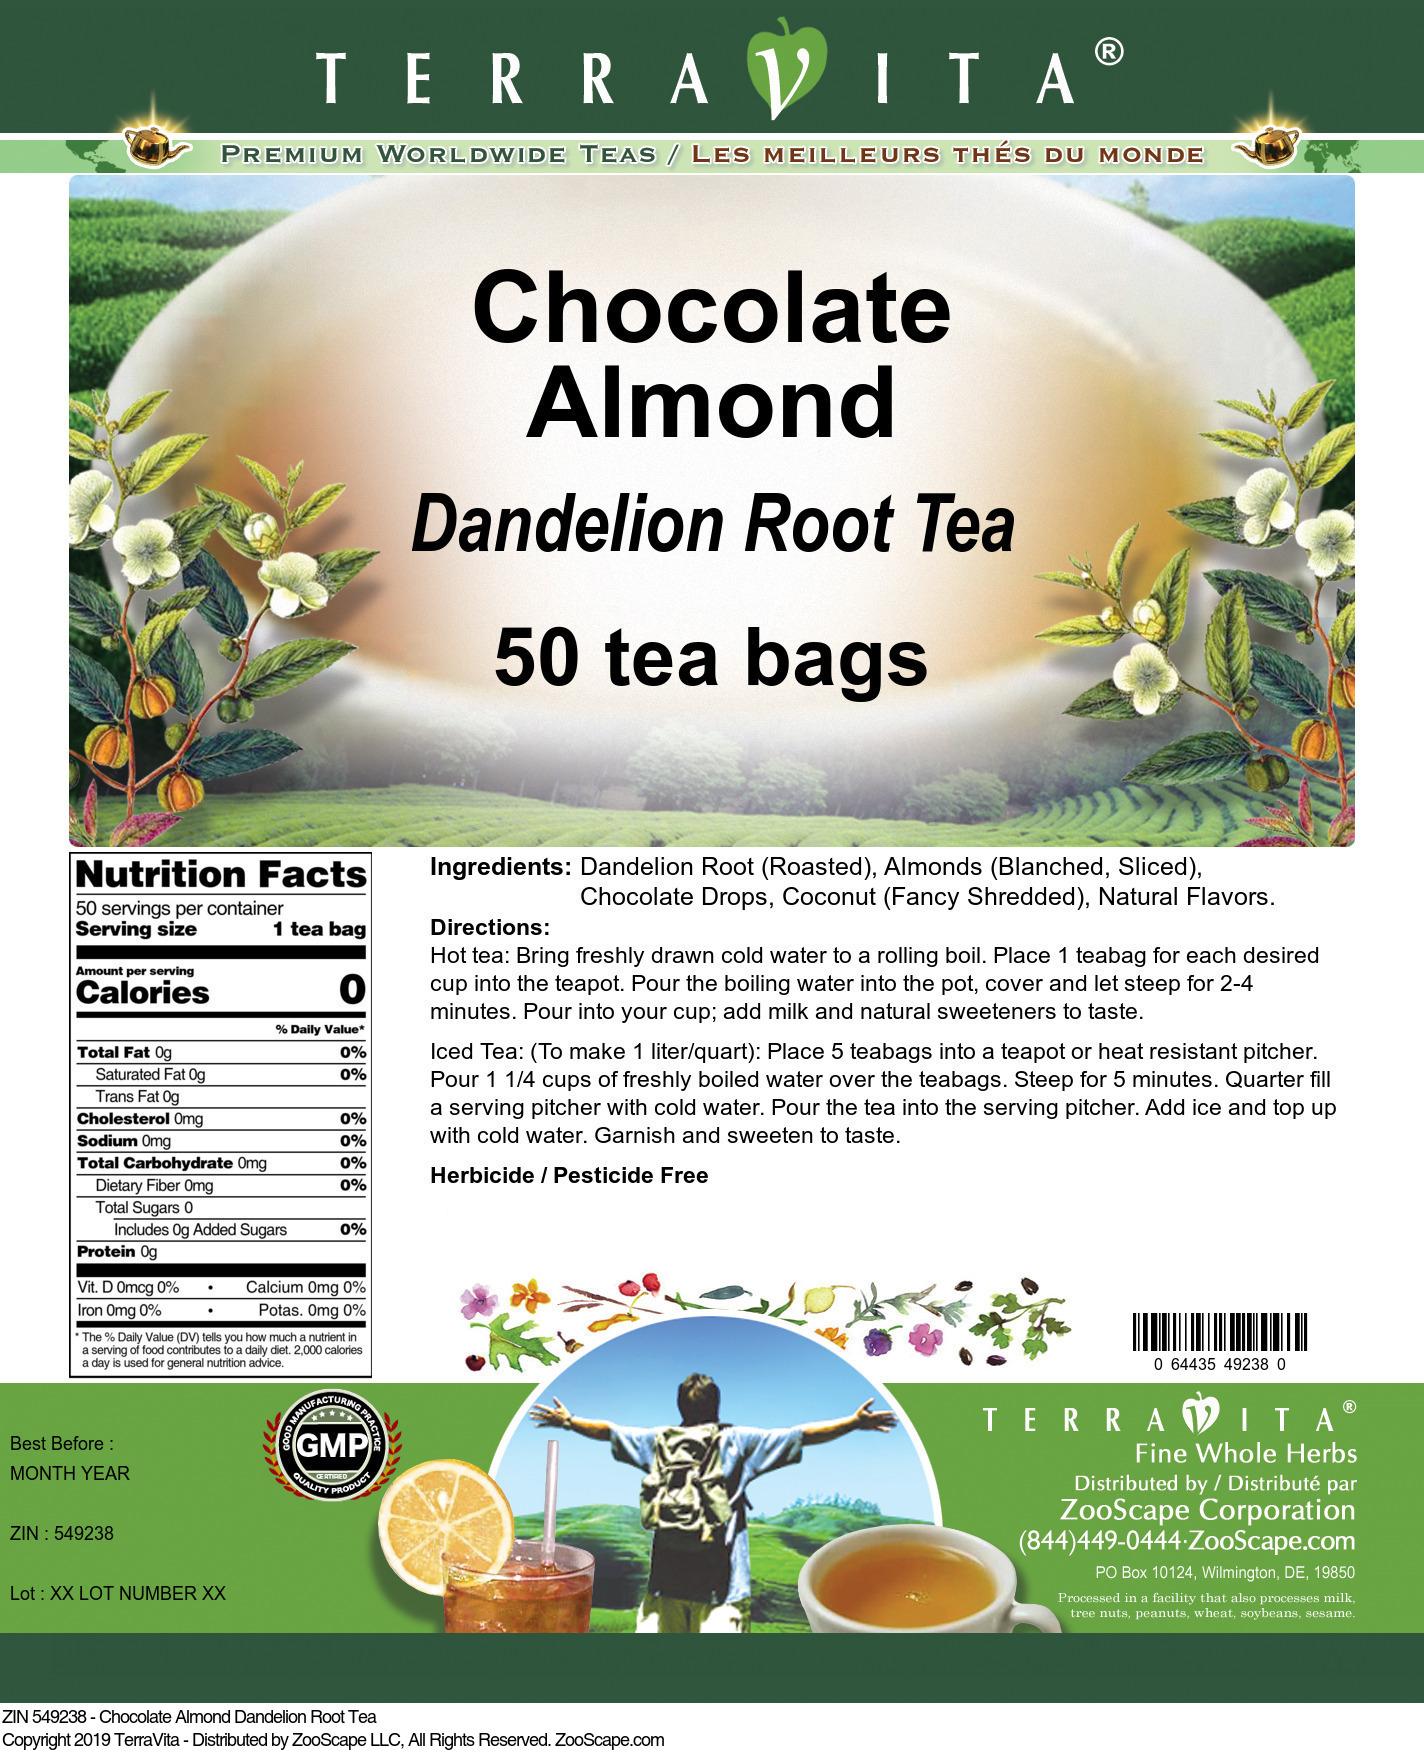 Chocolate Almond Dandelion Root